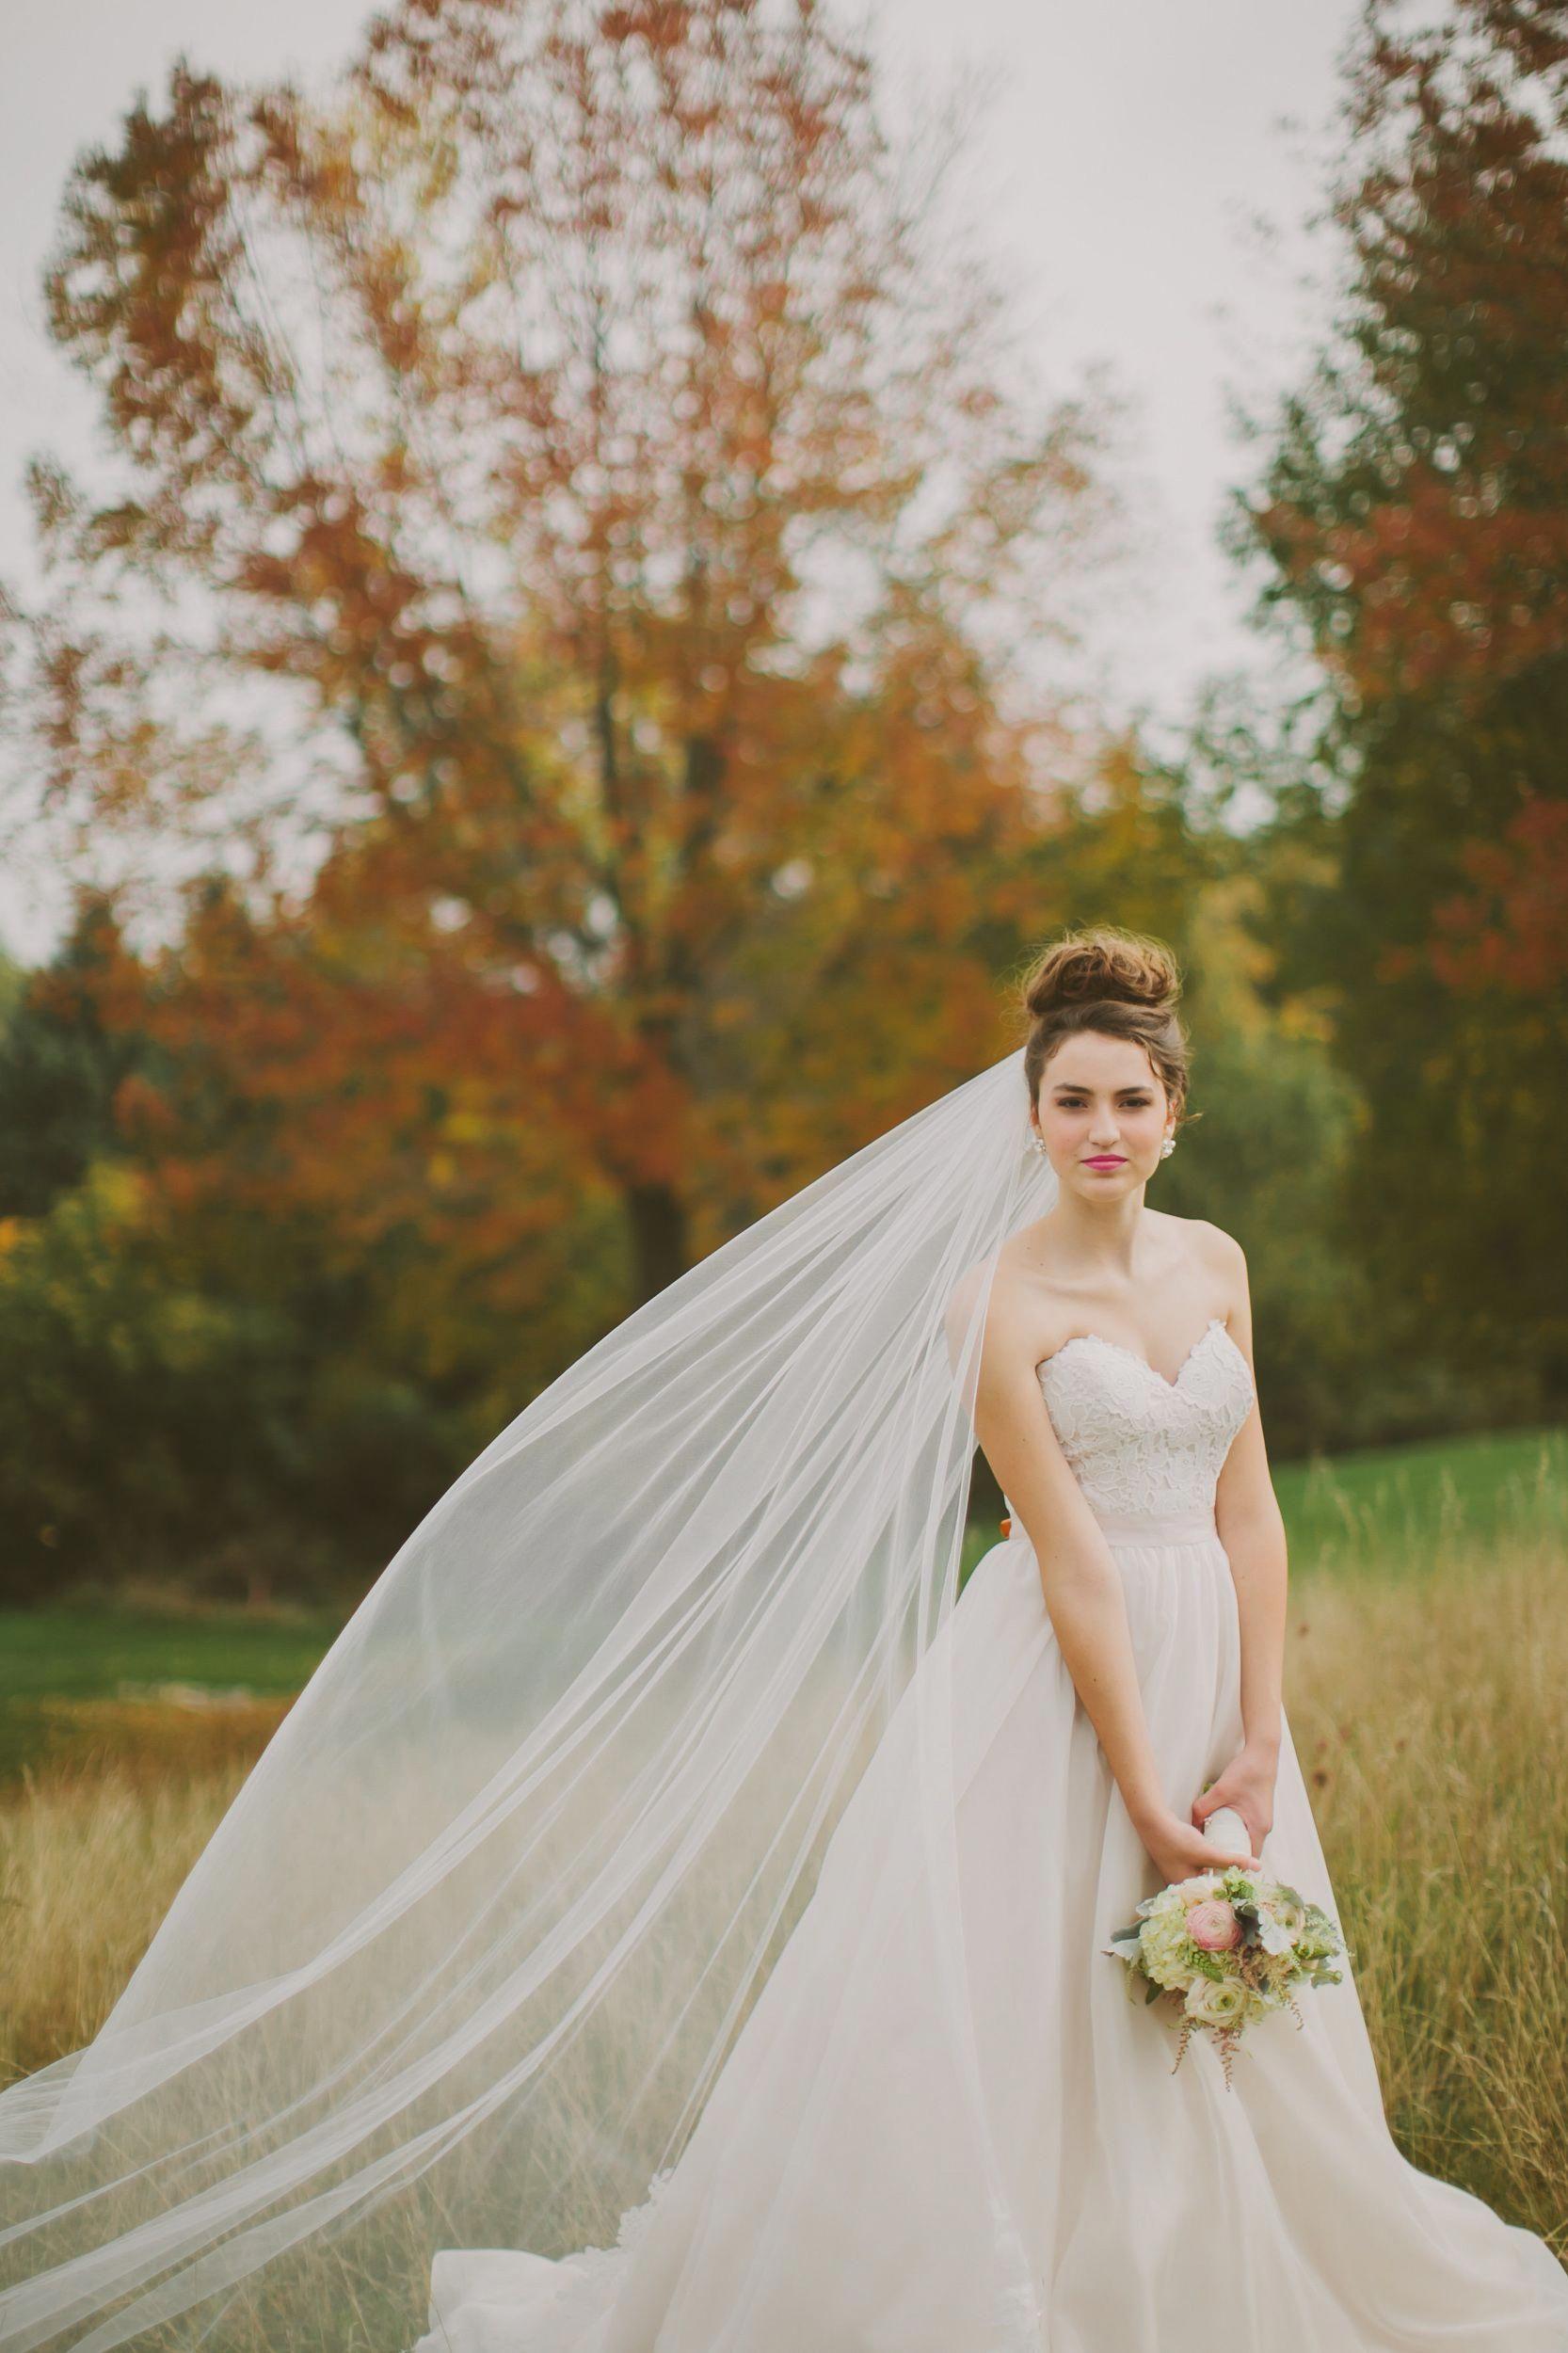 long hair wedding hairstyles with veil and tiara wedding